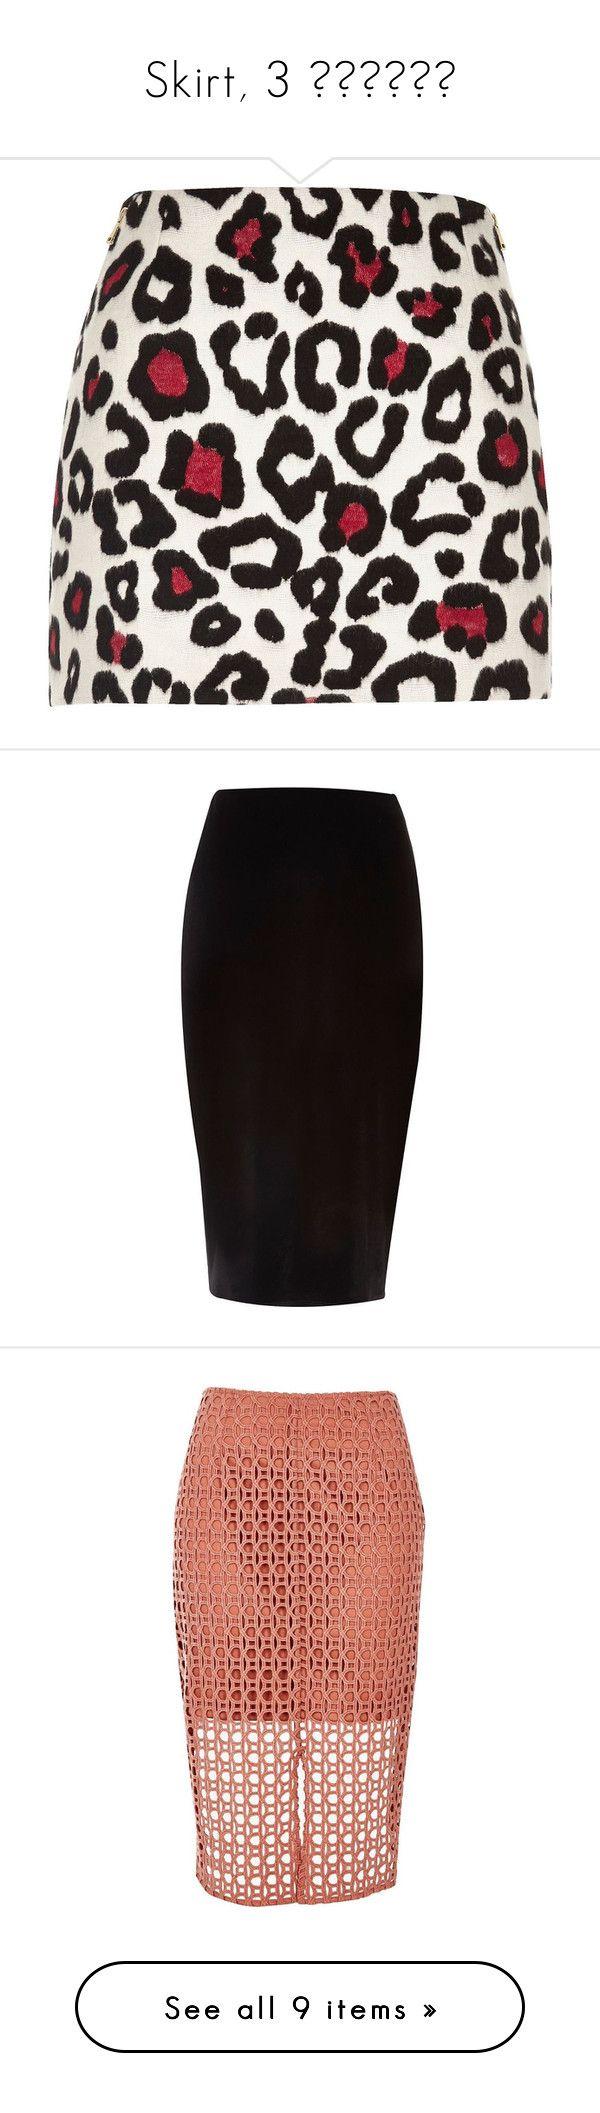 """Skirt, 3 تنانير"" by isror ❤ liked on Polyvore featuring skirts, tall skirts, leopard skirt, river island, leopard print skirt, white skirt, bottoms, black, midi skirts and women"